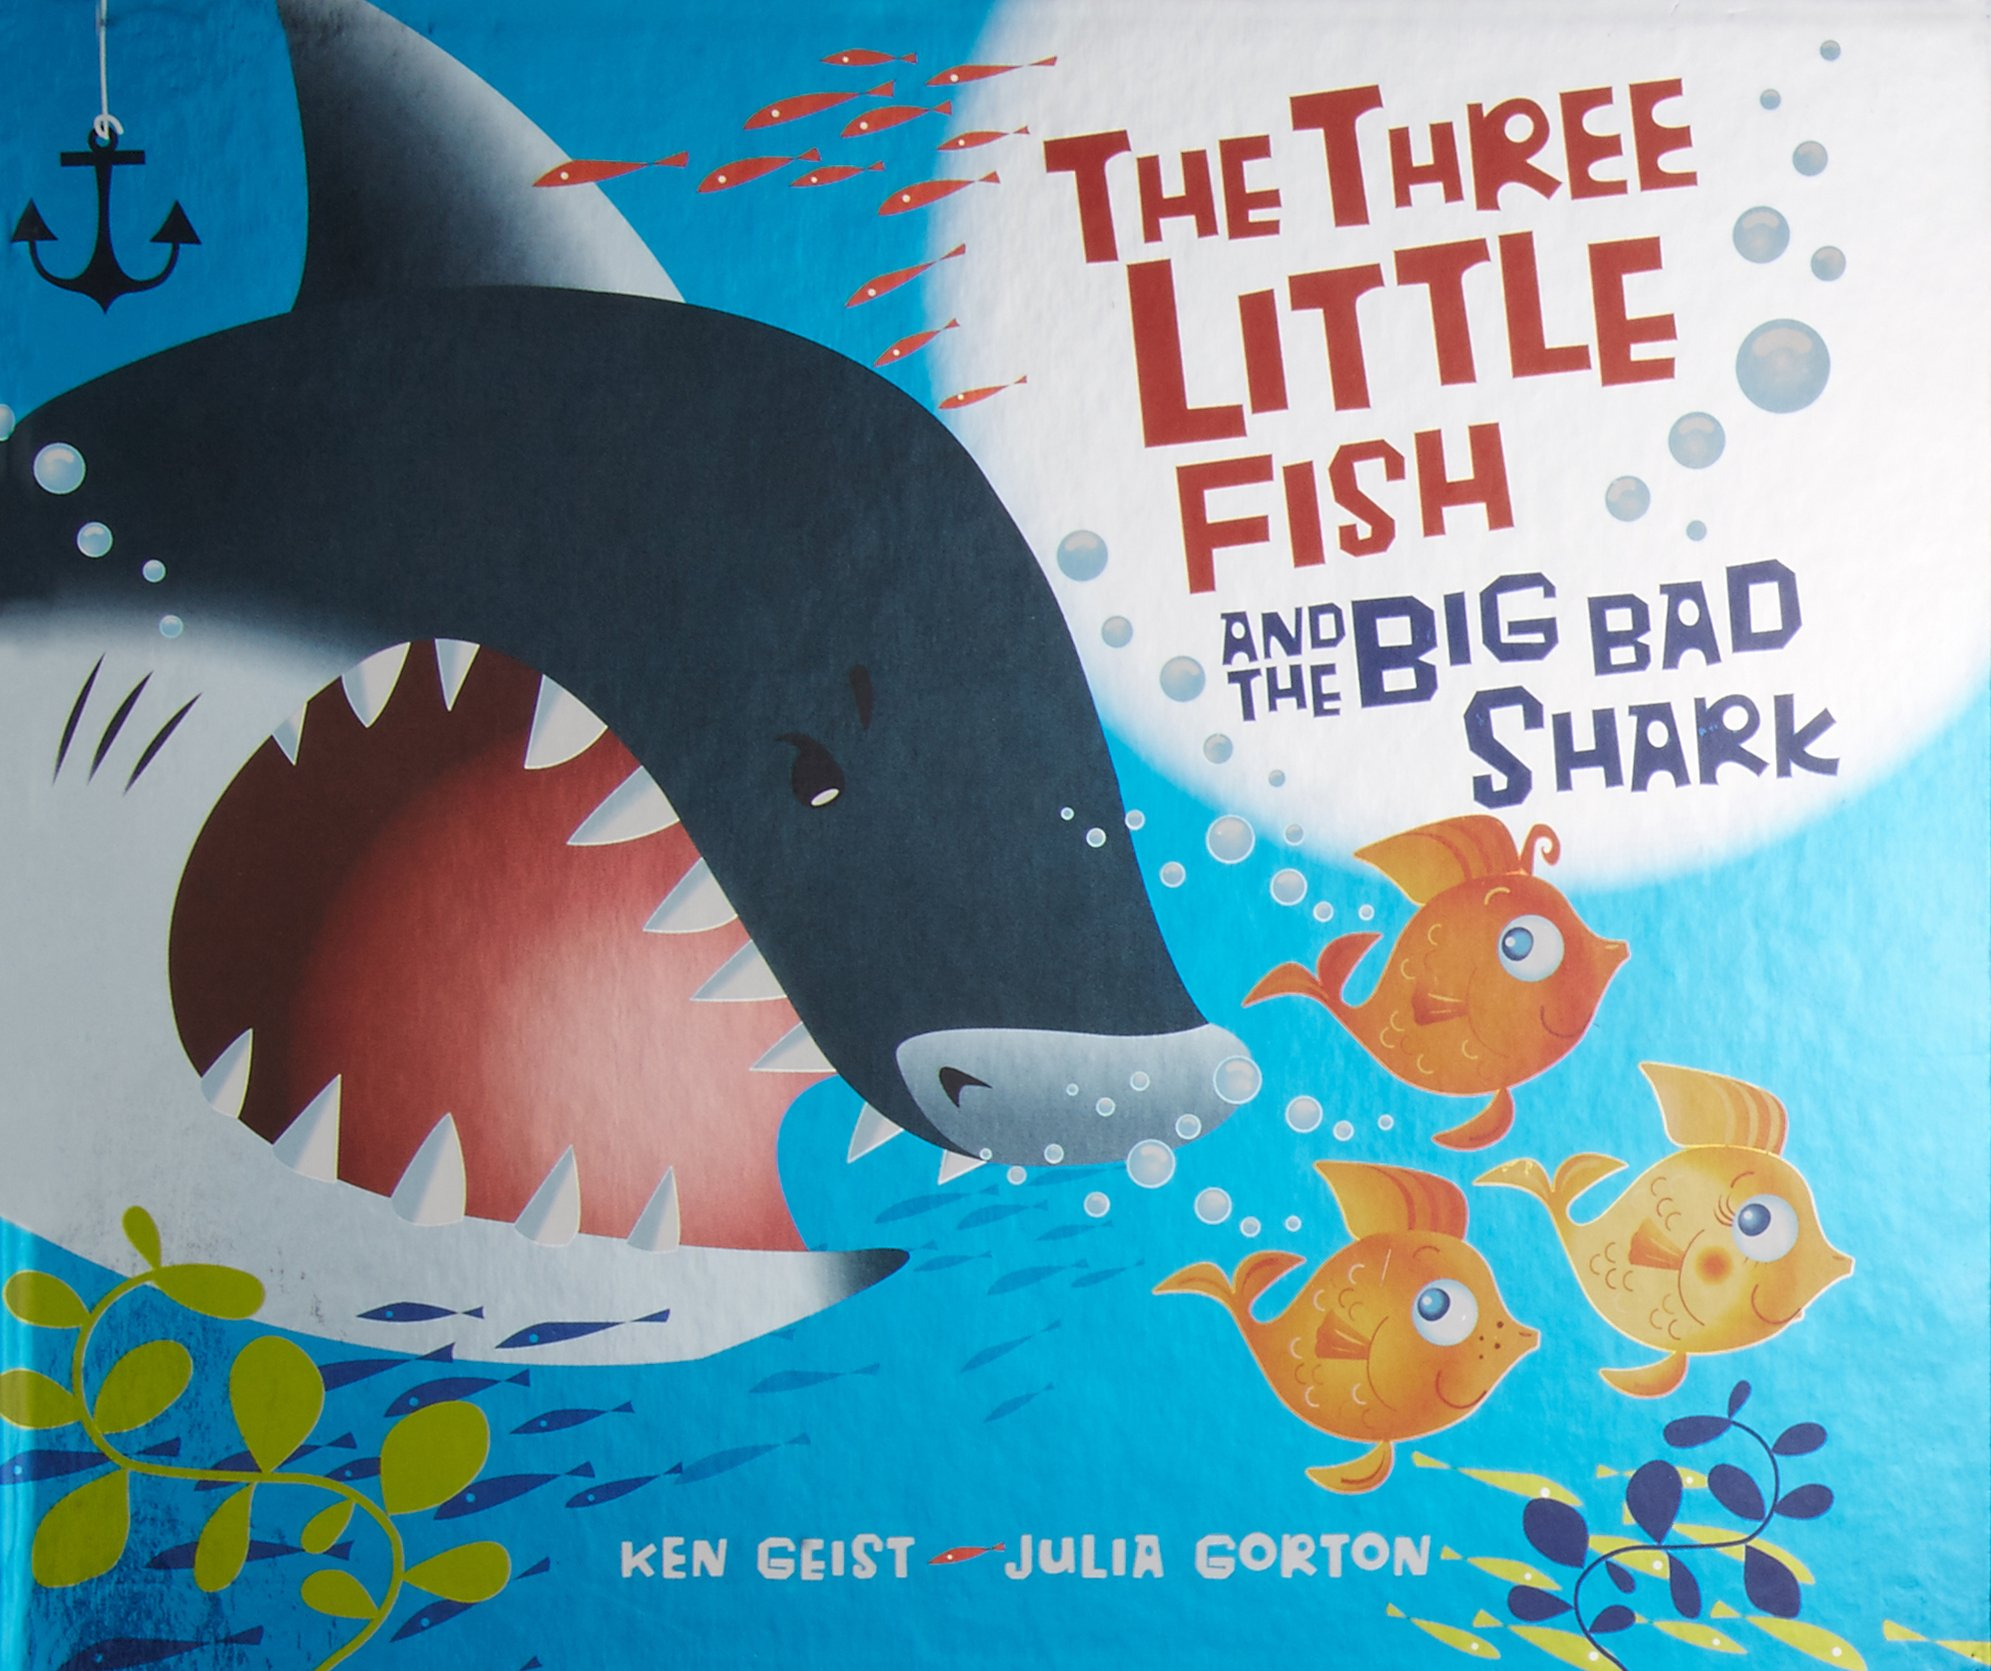 The three little fish and the big bad shark will grace ken geist julia gorton 8601300270425 amazon com books